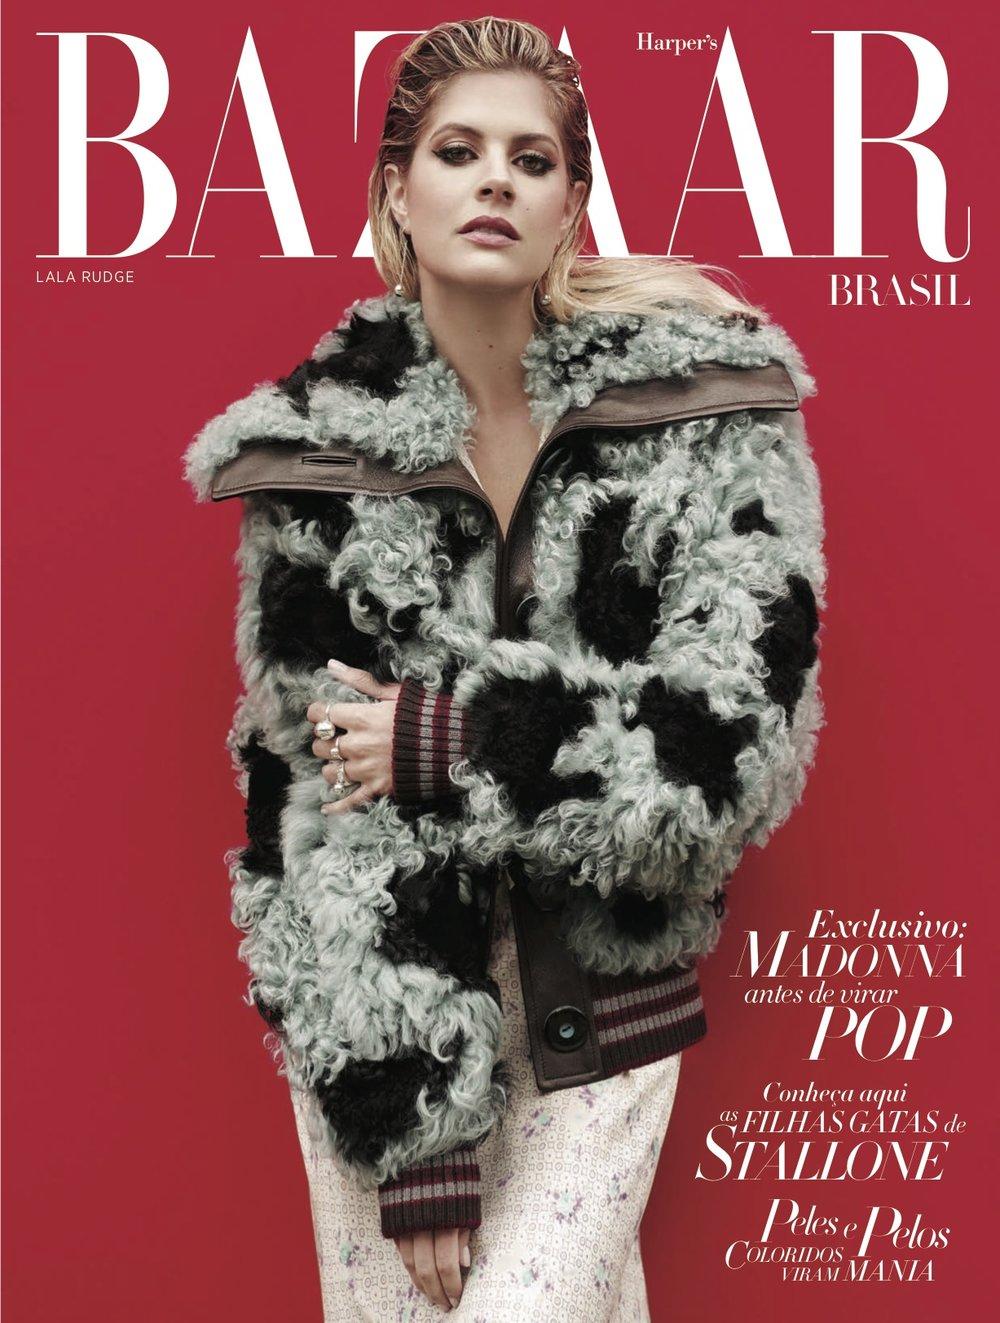 Harper Bazaar Brasil LALA Rudge.jpg